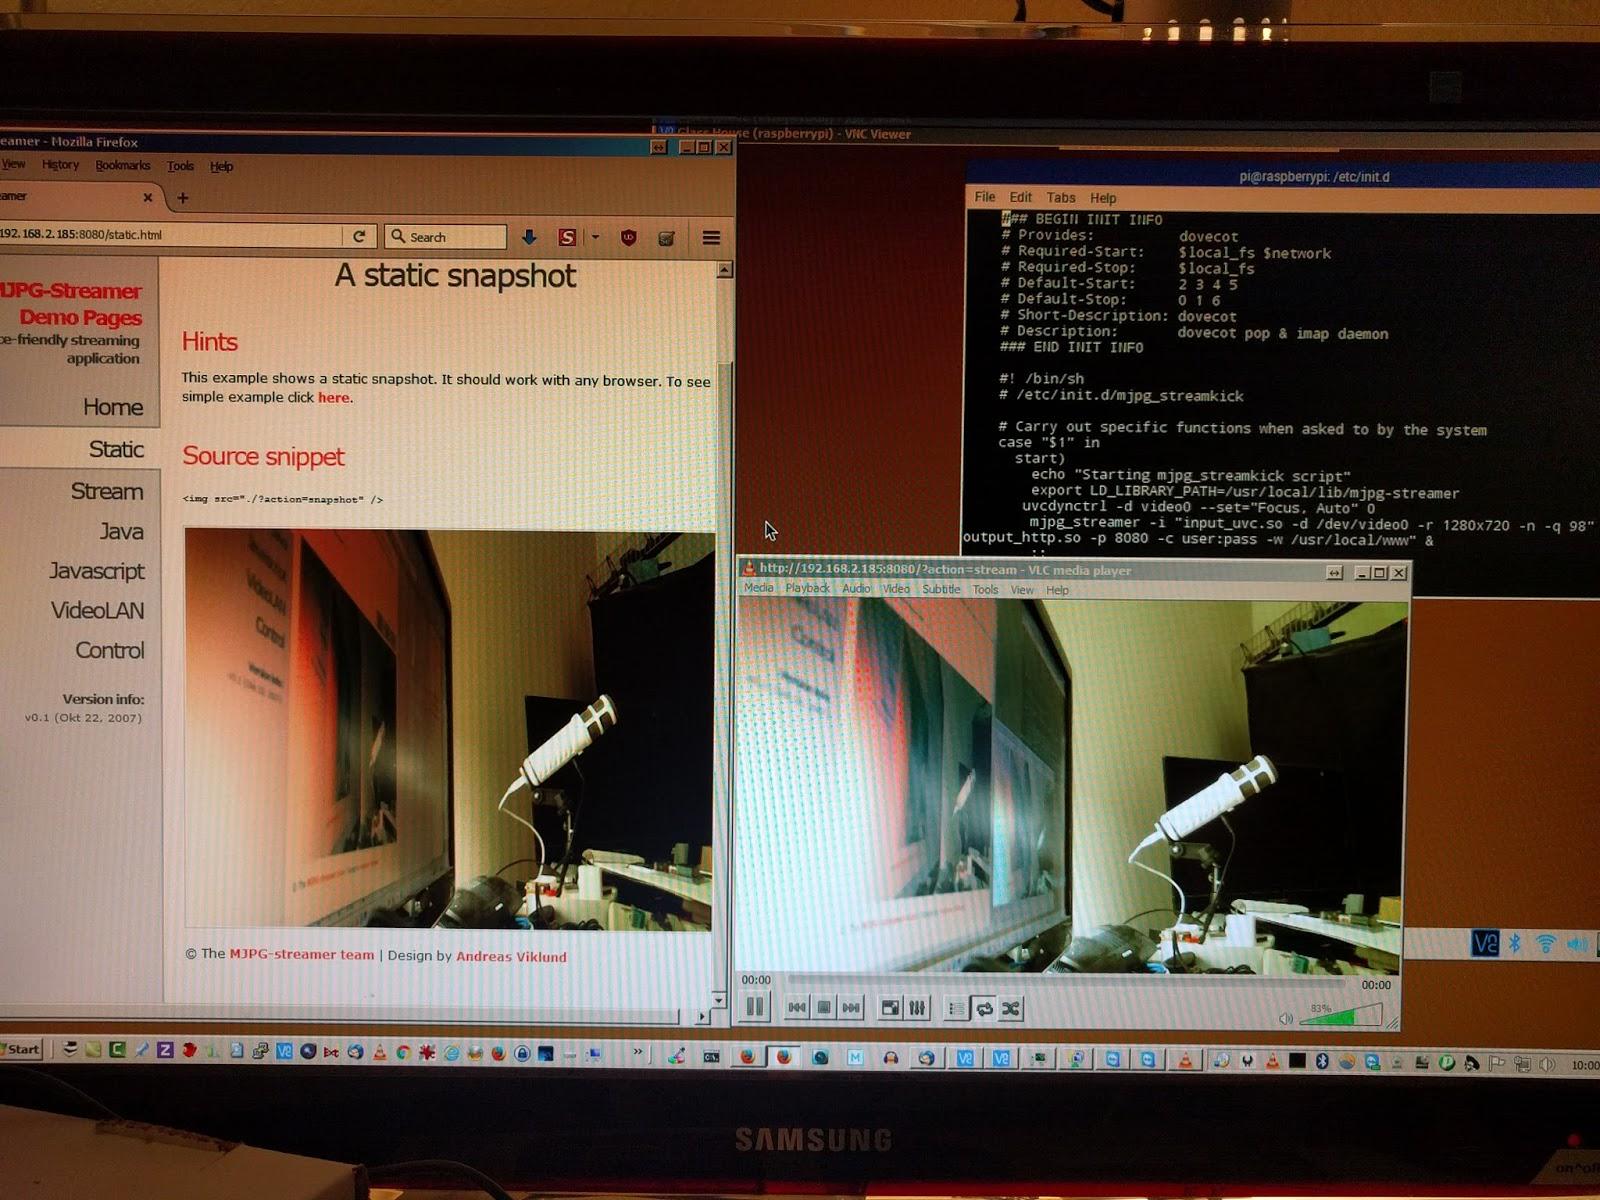 John Willis: Raspberry Pi Zero W - Streaming Webcam